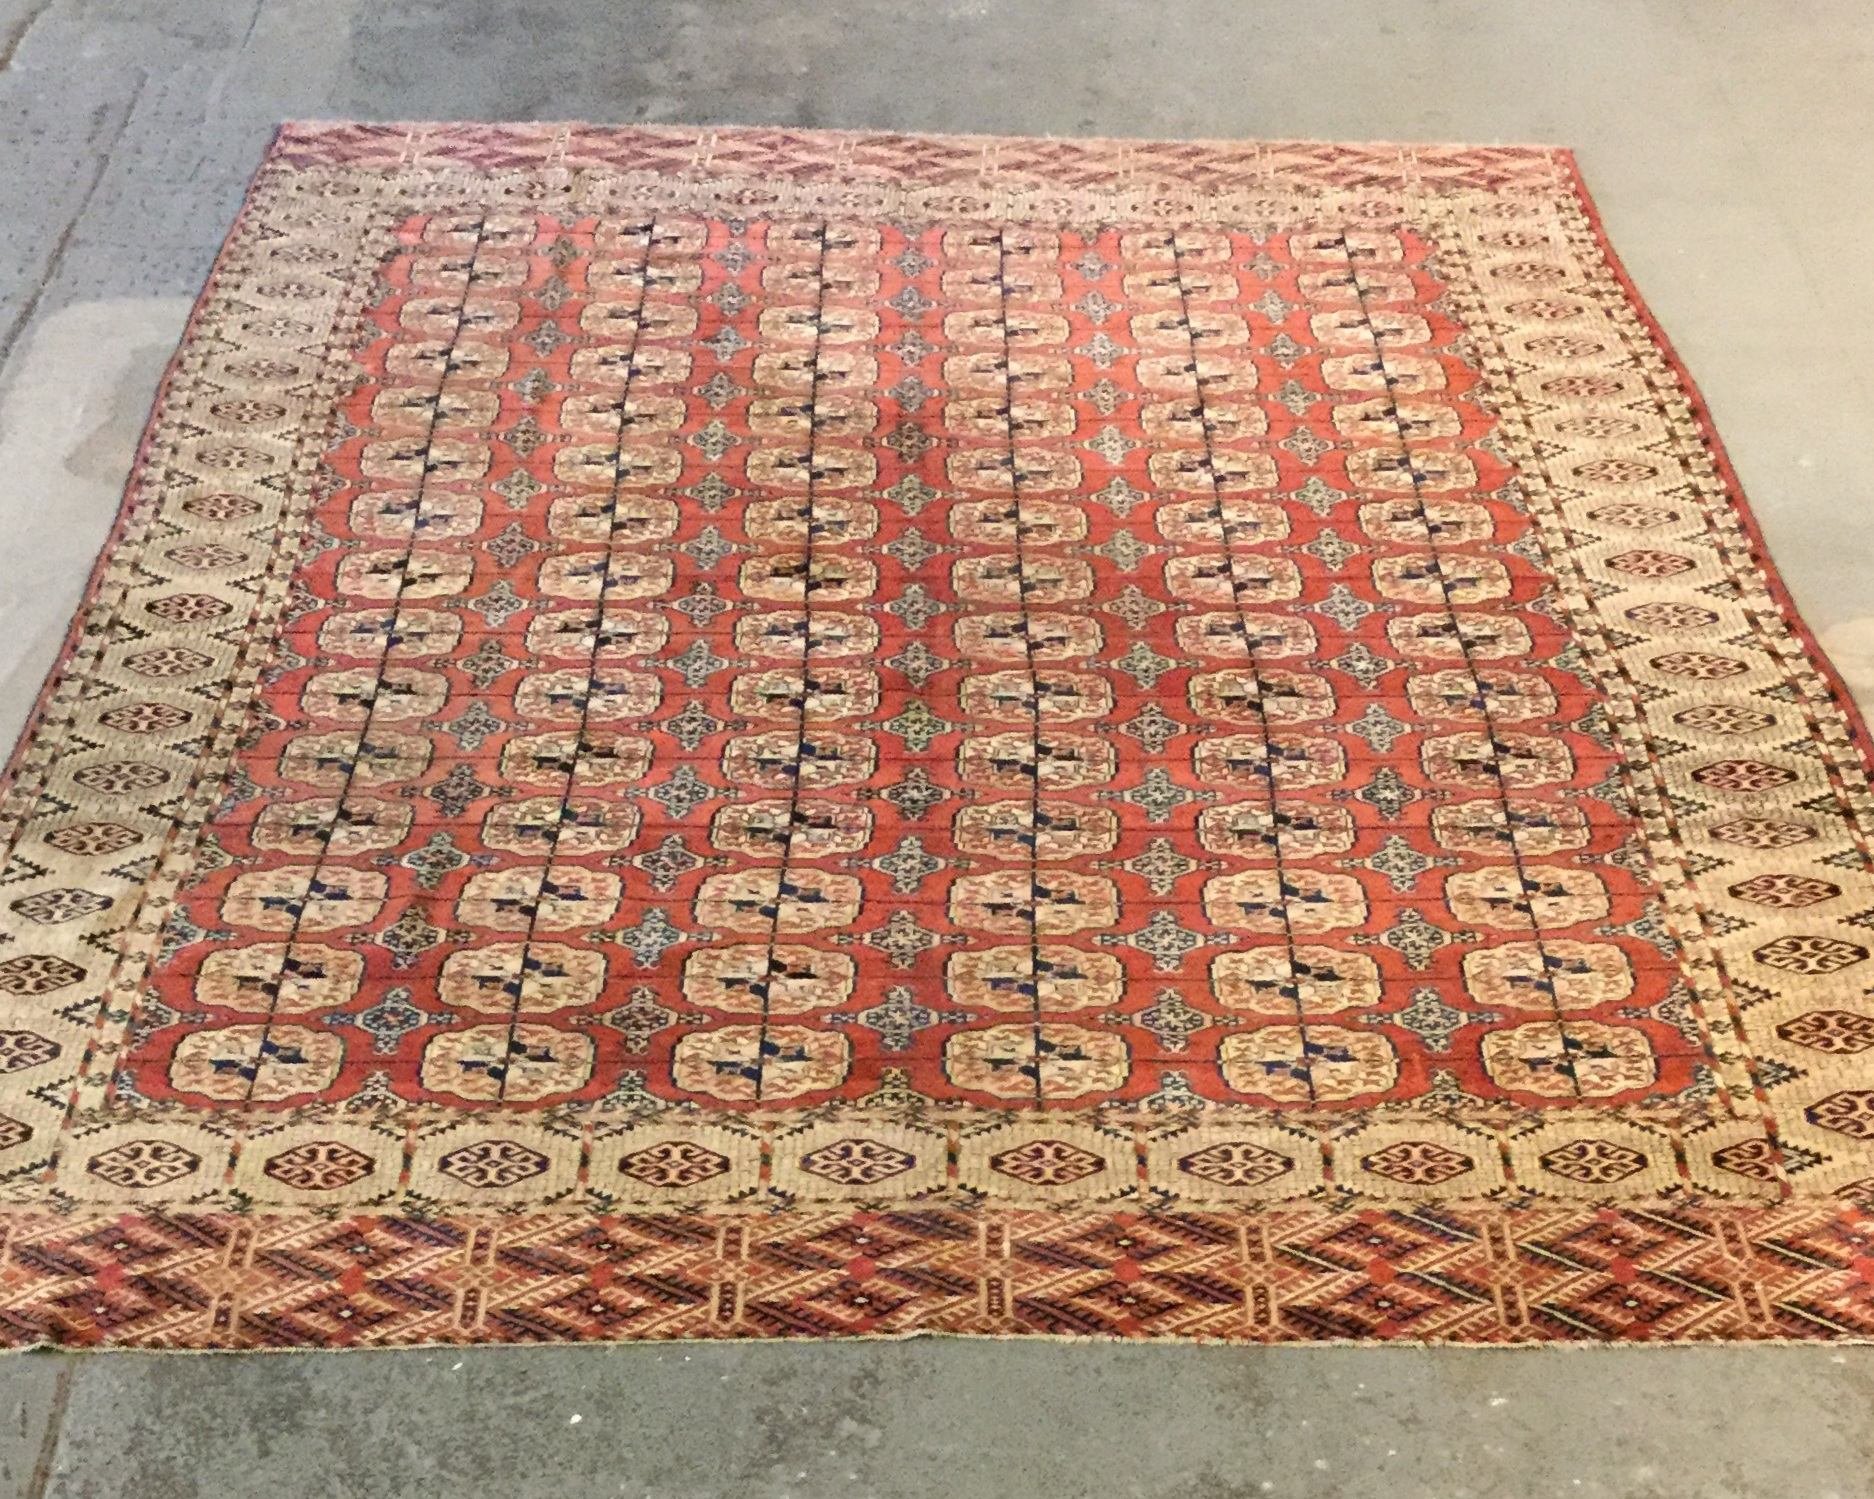 Traditional Turkomen - Circa 2000'sSize Measurements: 345cm x 253cm